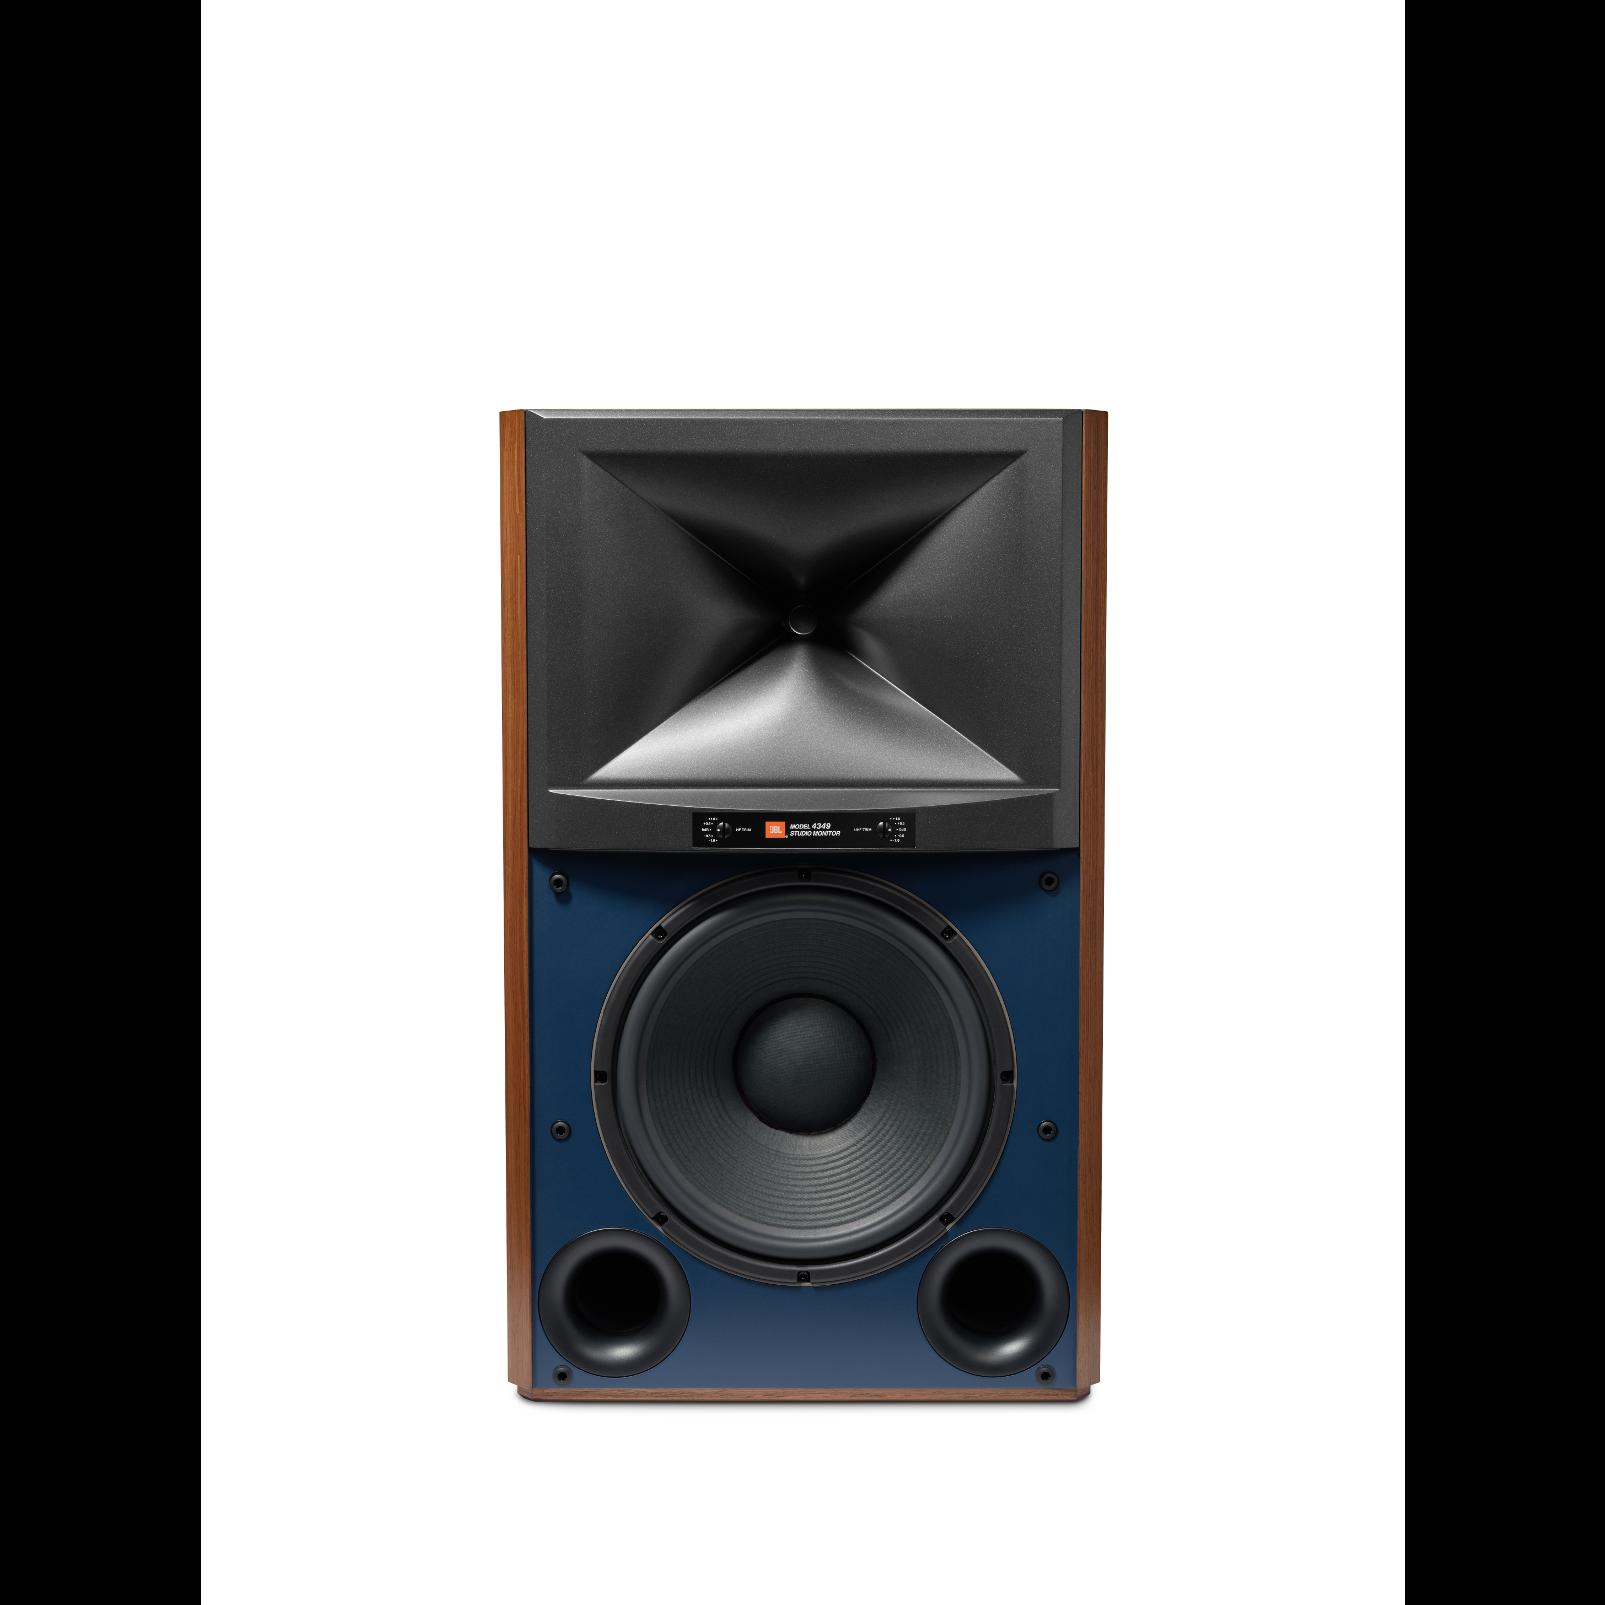 4349 - Walnut - 12-inch (300mm) 2-way Studio Monitor Loudspeaker - Detailshot 1